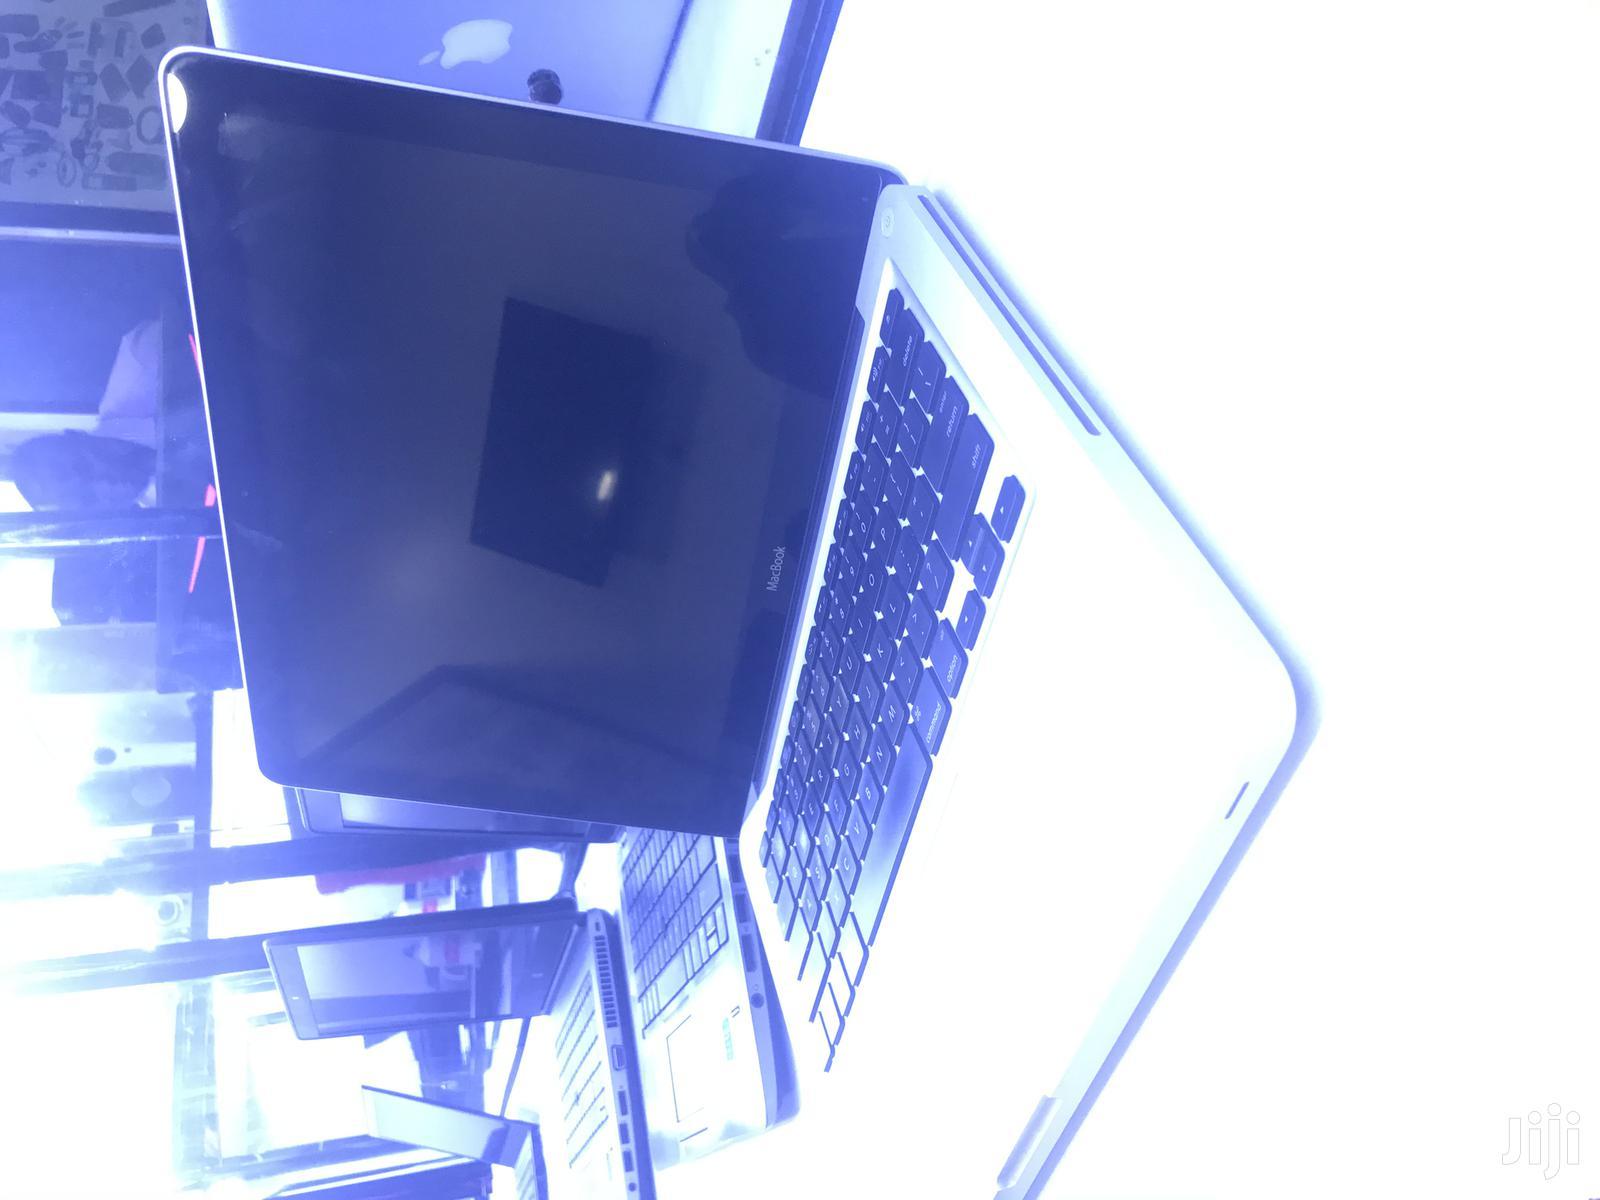 Archive: Laptop Apple MacBook 4GB Intel Core 2 Duo HDD 500GB